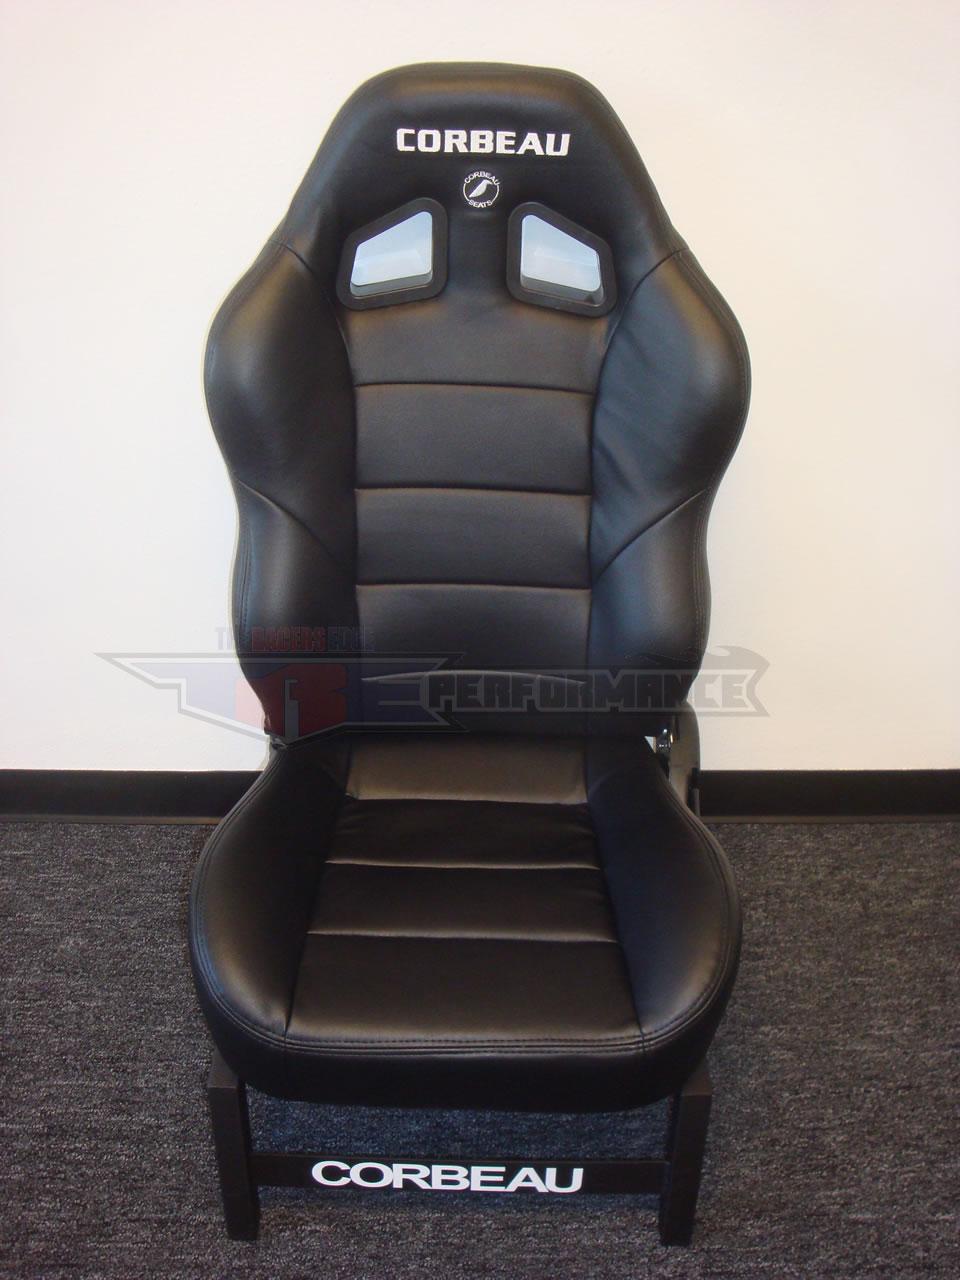 Corbeau Baja Xrs Black Vinyl New Reclining Racing Seat